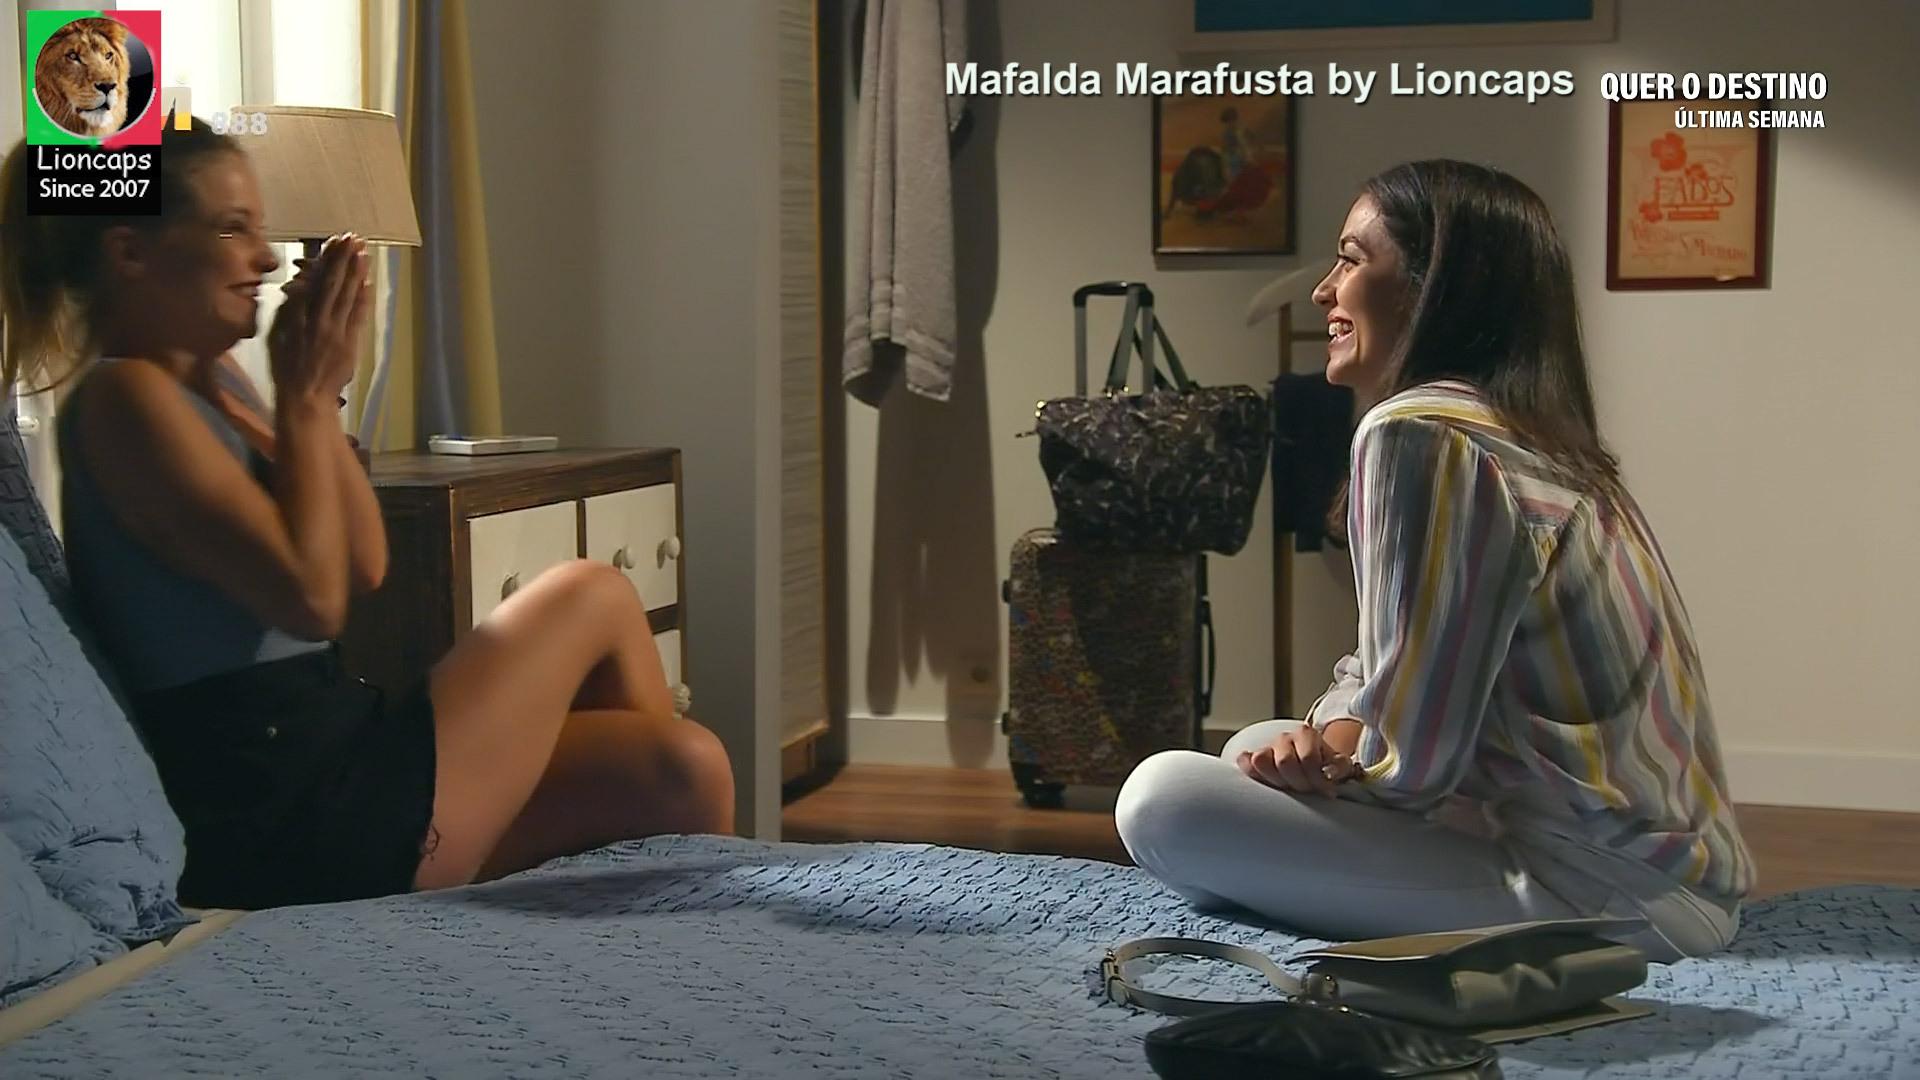 mafalda_marafusta_quer_destino_lioncaps_08_11_2020_03 (9).jpg